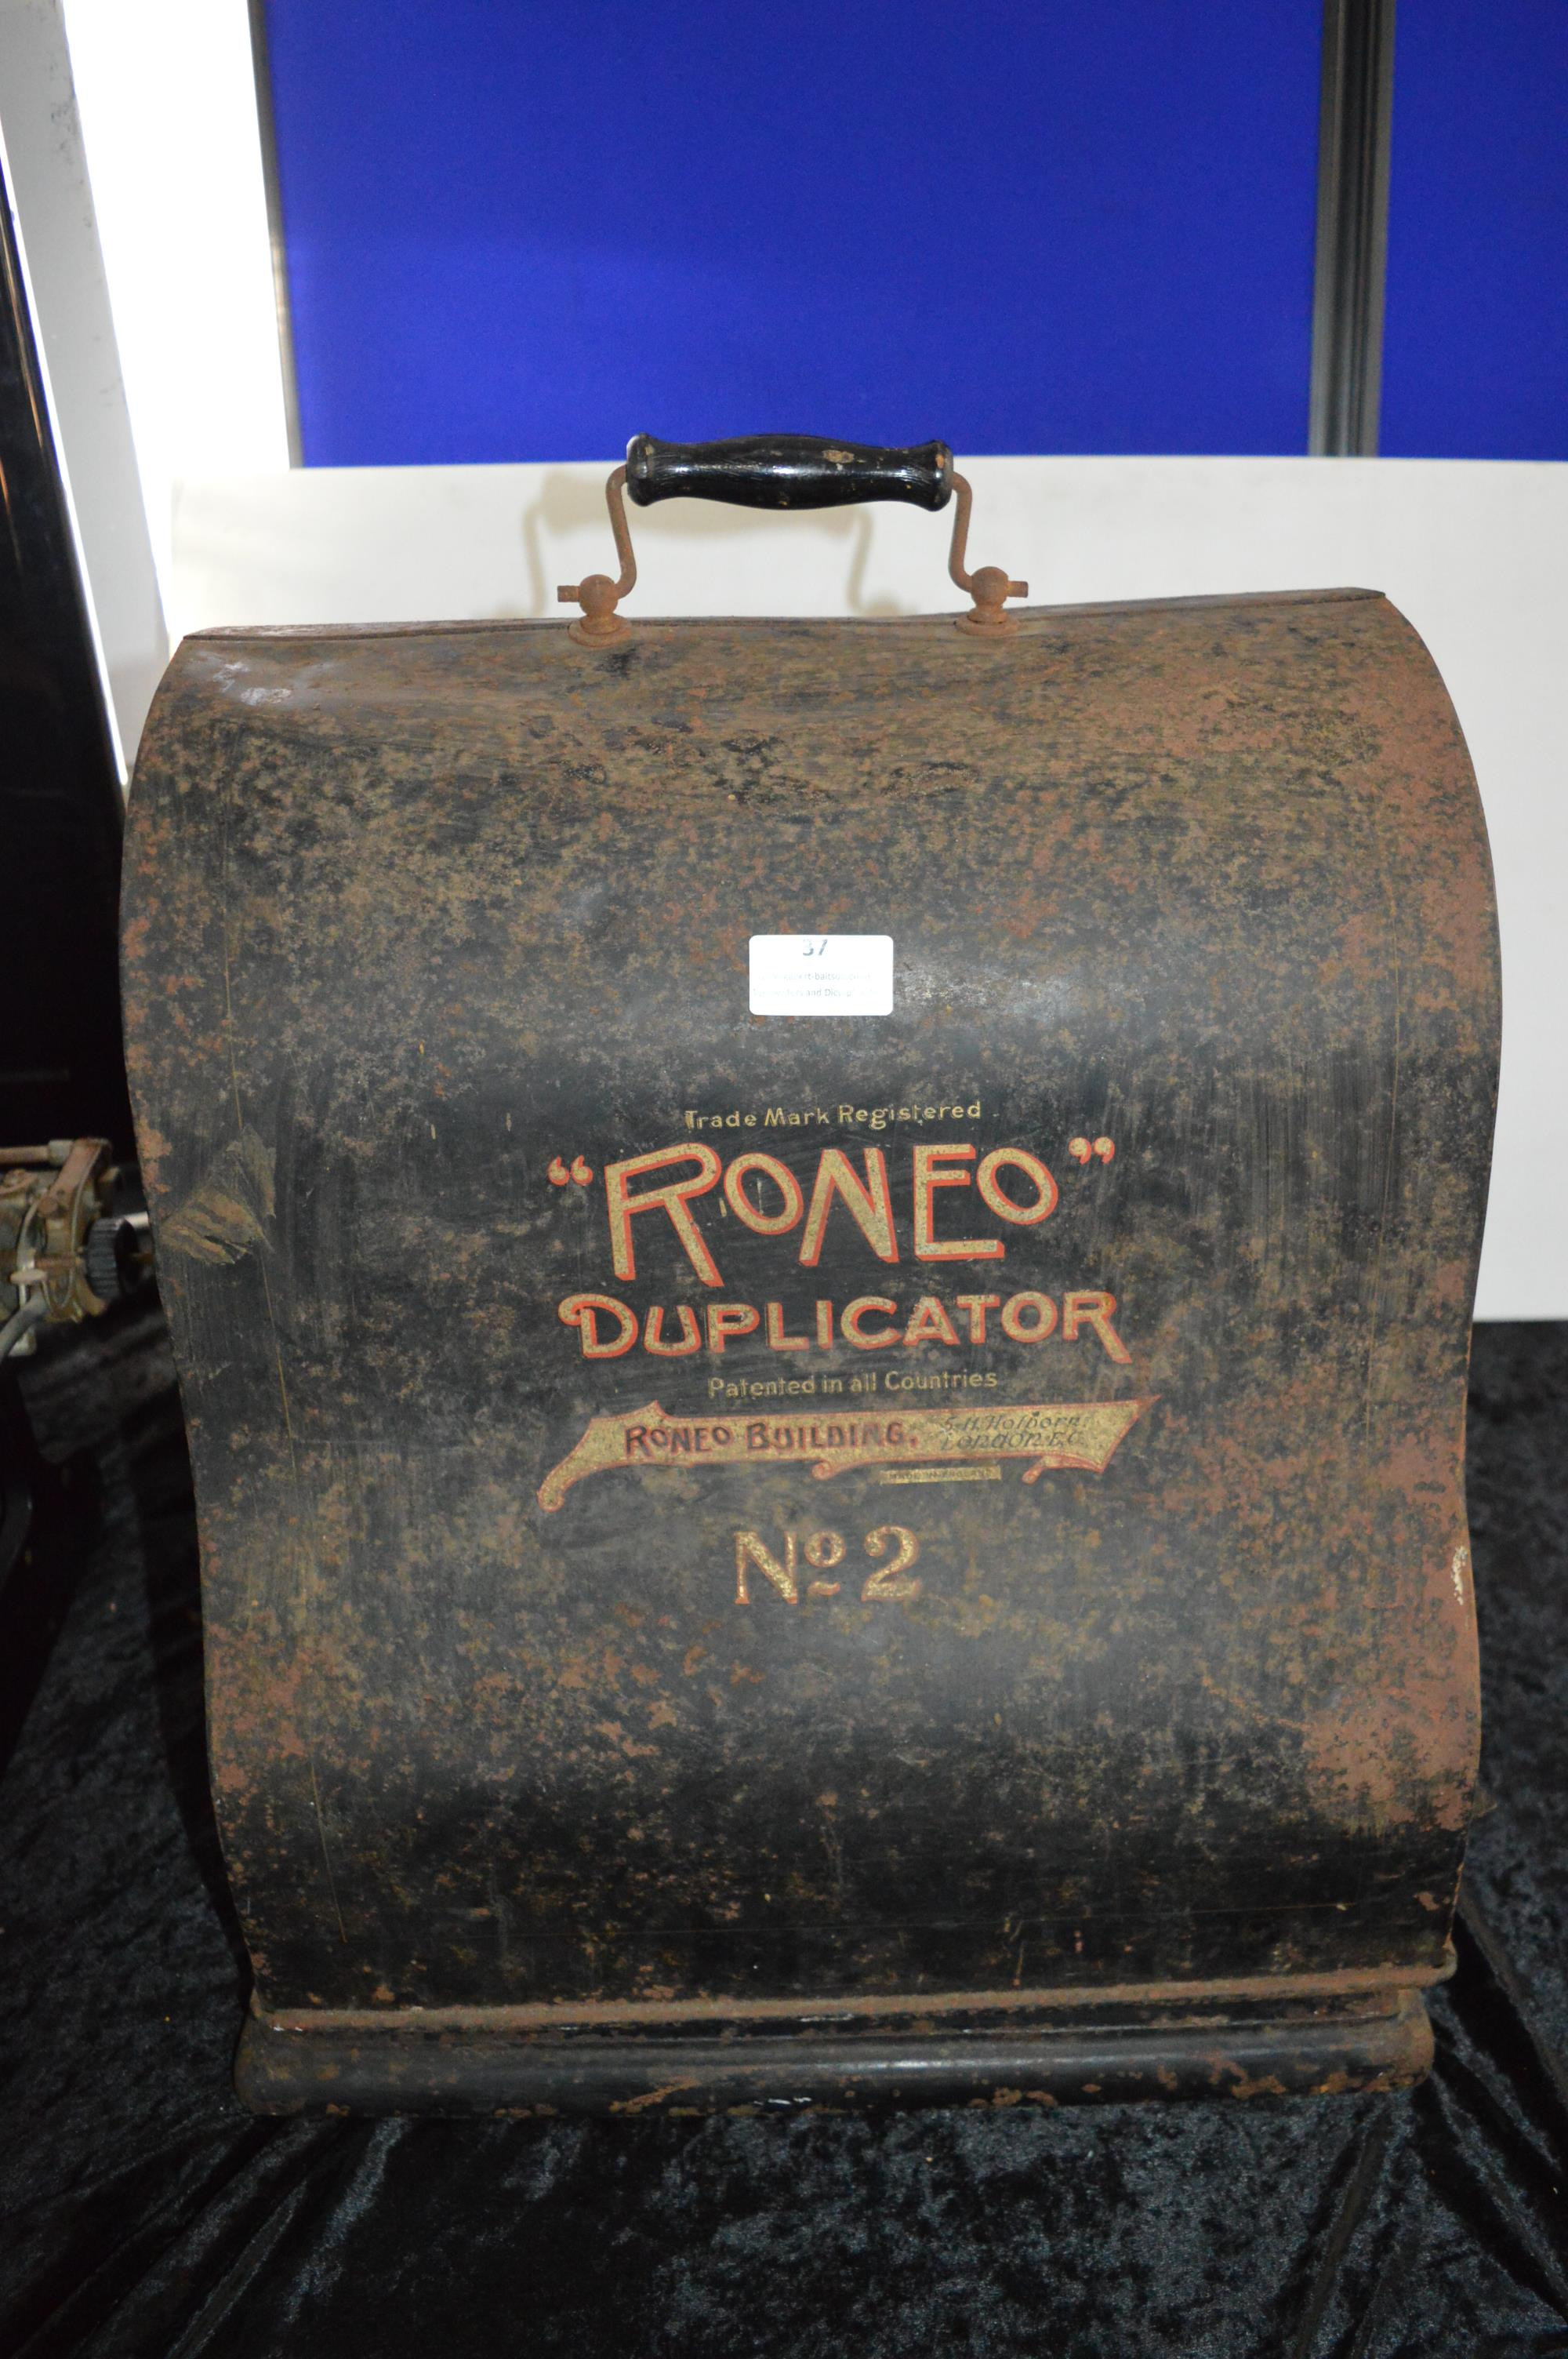 Romeo No.02 Duplicator In Original Carrying Case - London - Image 2 of 2